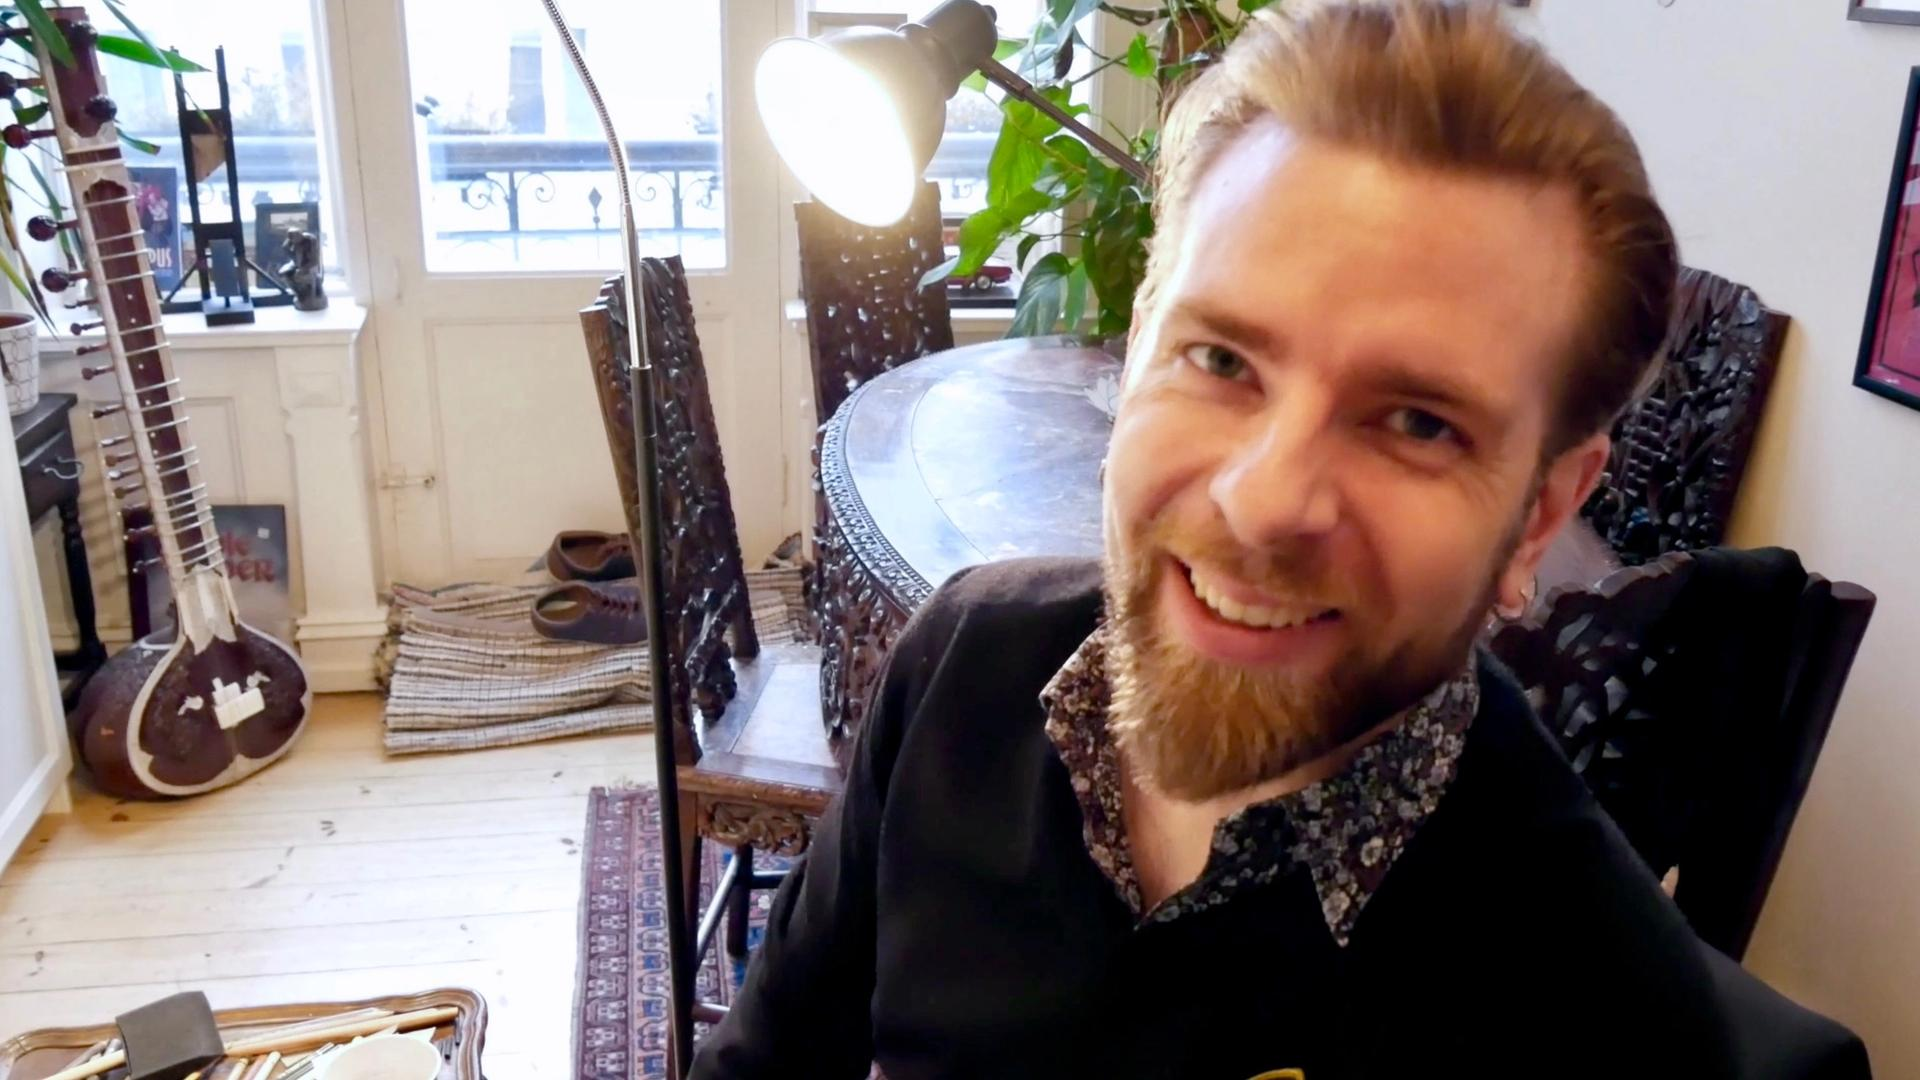 Sverre Malling